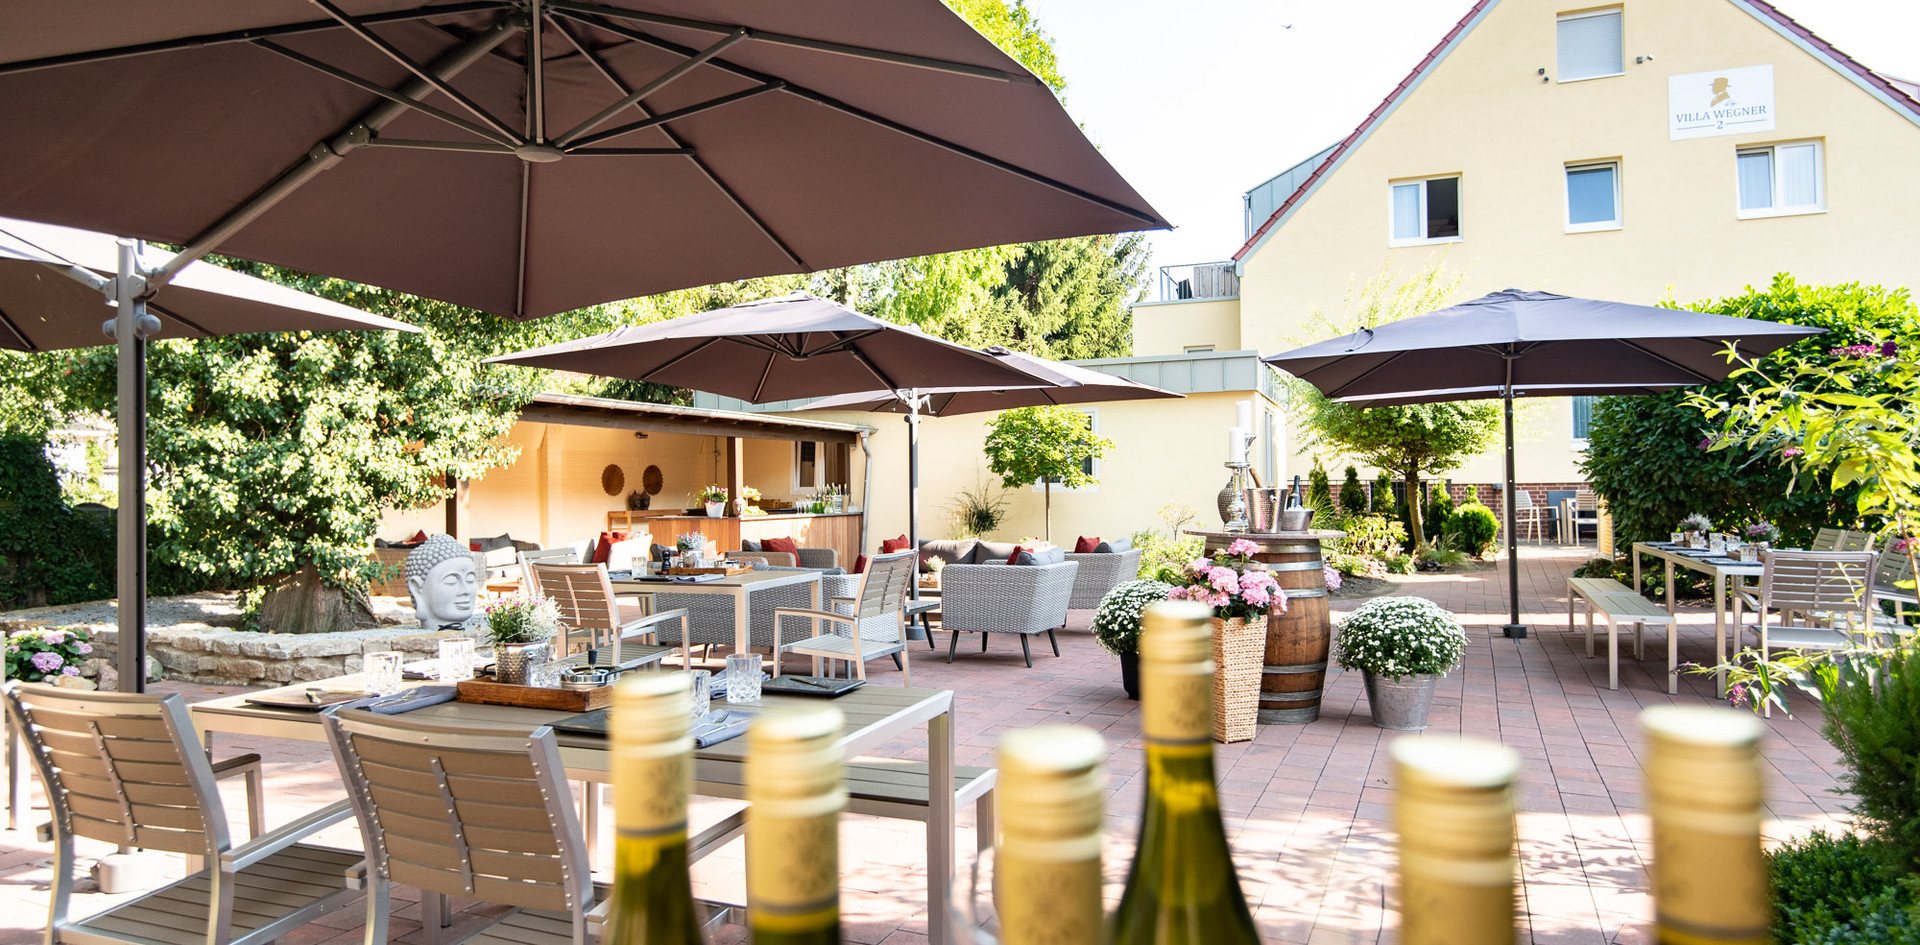 Sektempfang Gartenterrasse Hotel Wegner - the culinary art hotel